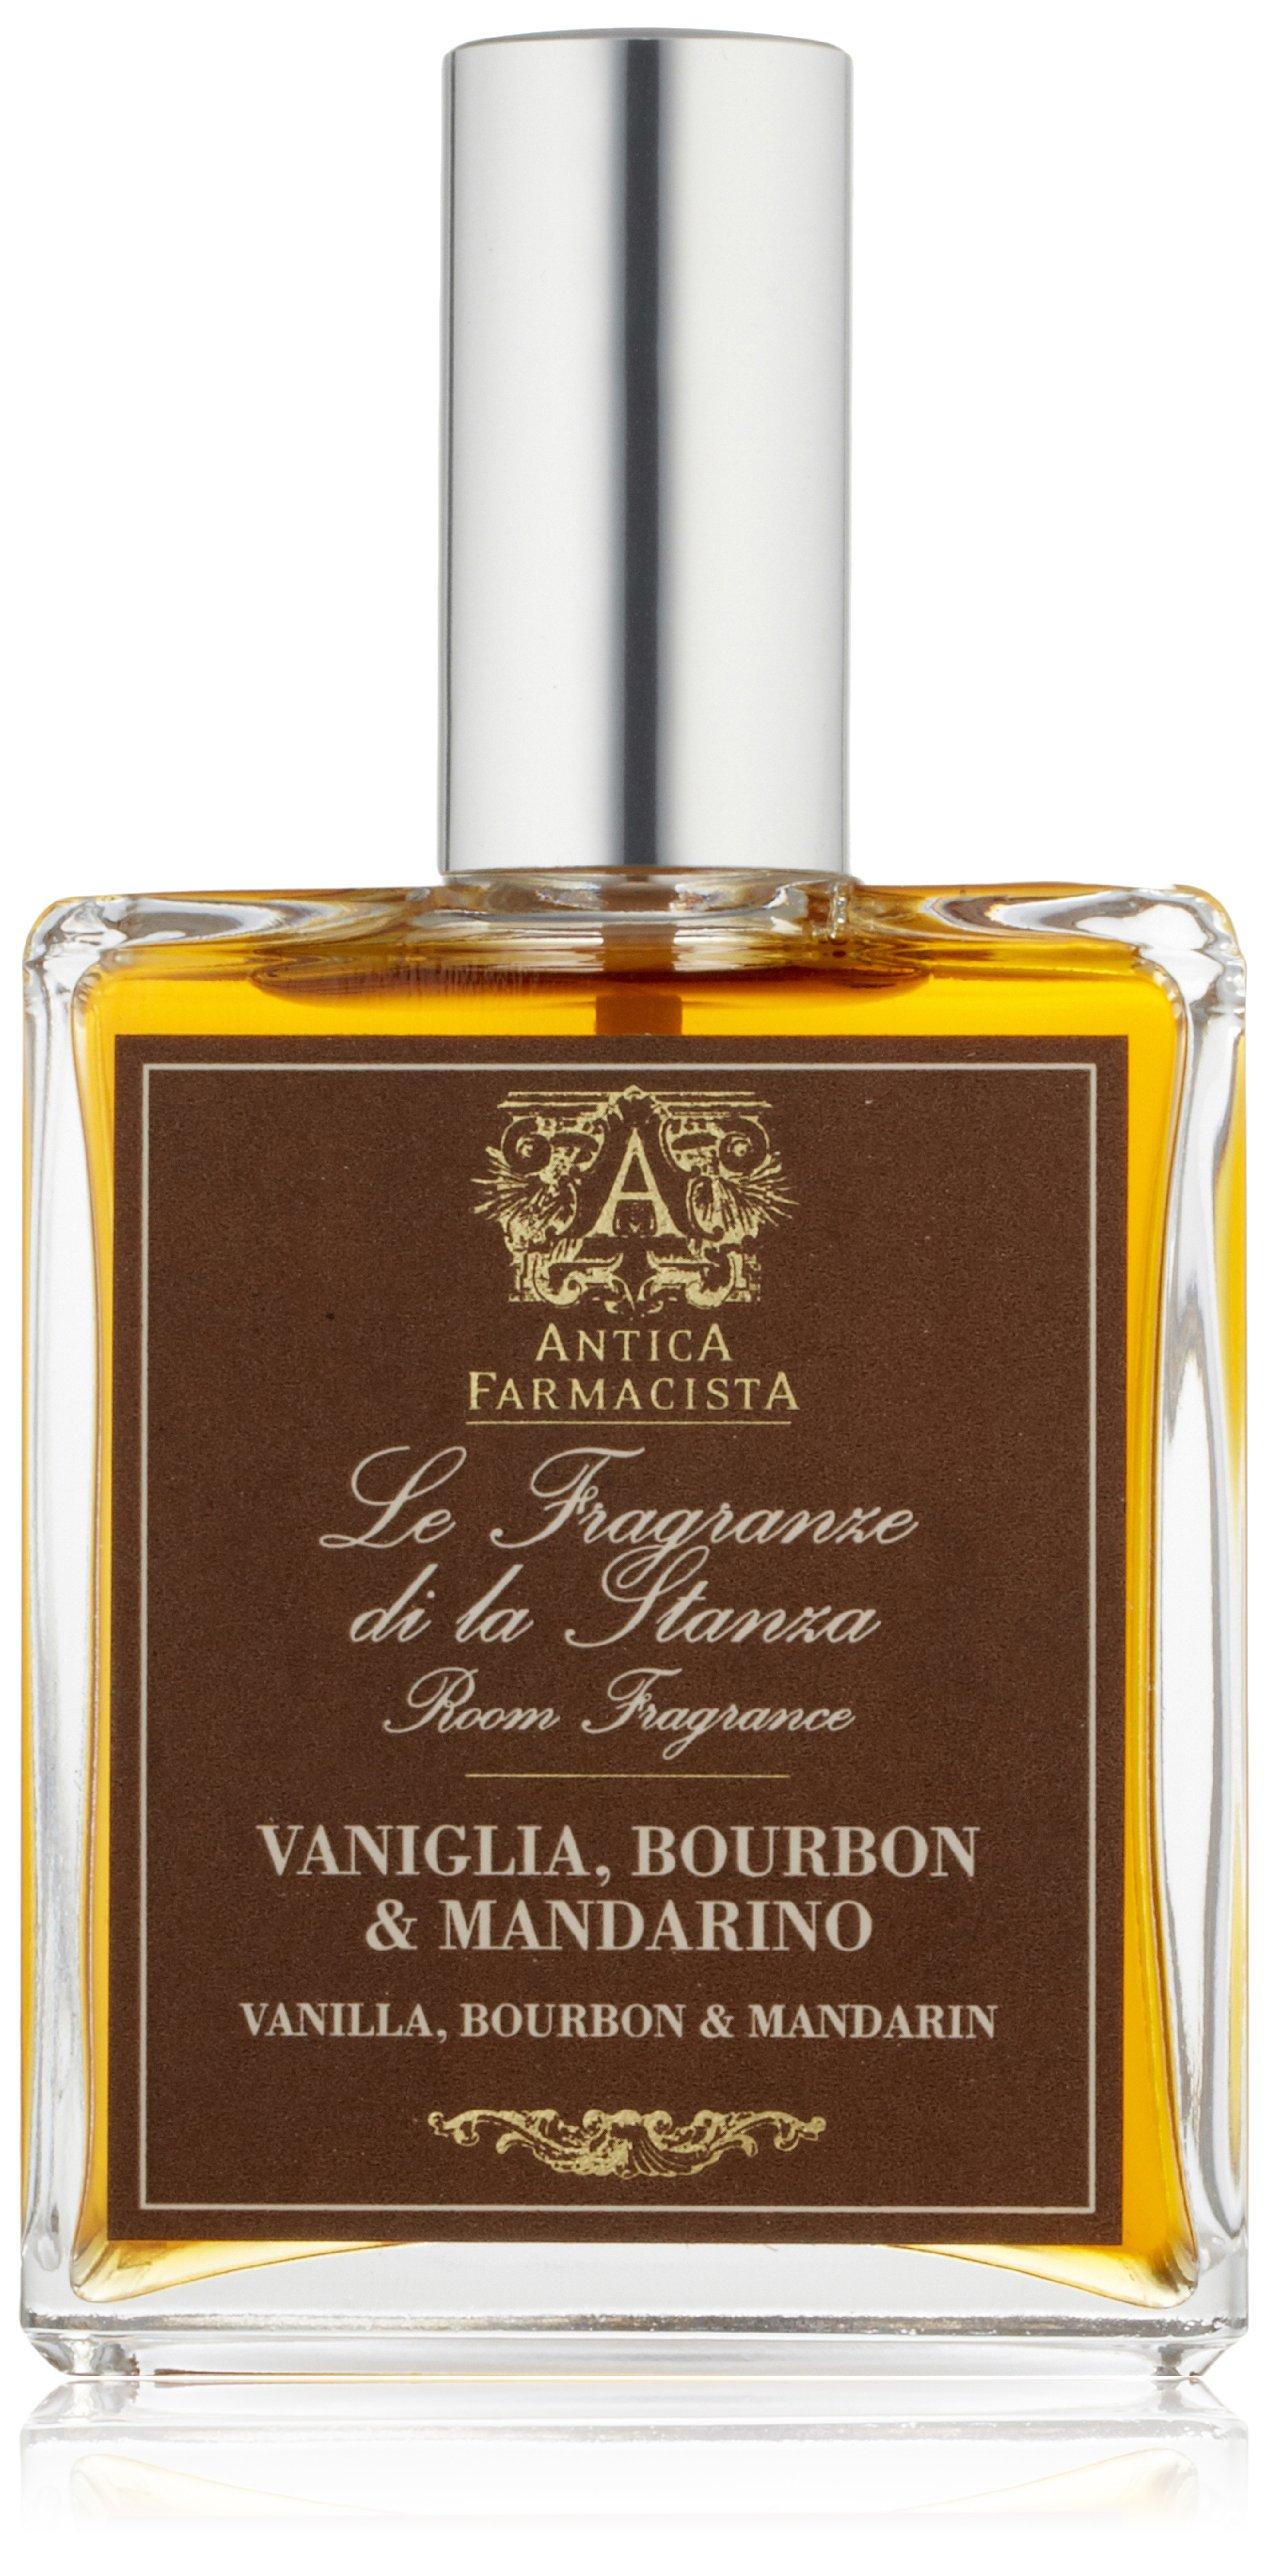 Antica Farmacista Room Fragrance, Vanilla Bourbon & Mandarin, 3.4 Fl Oz